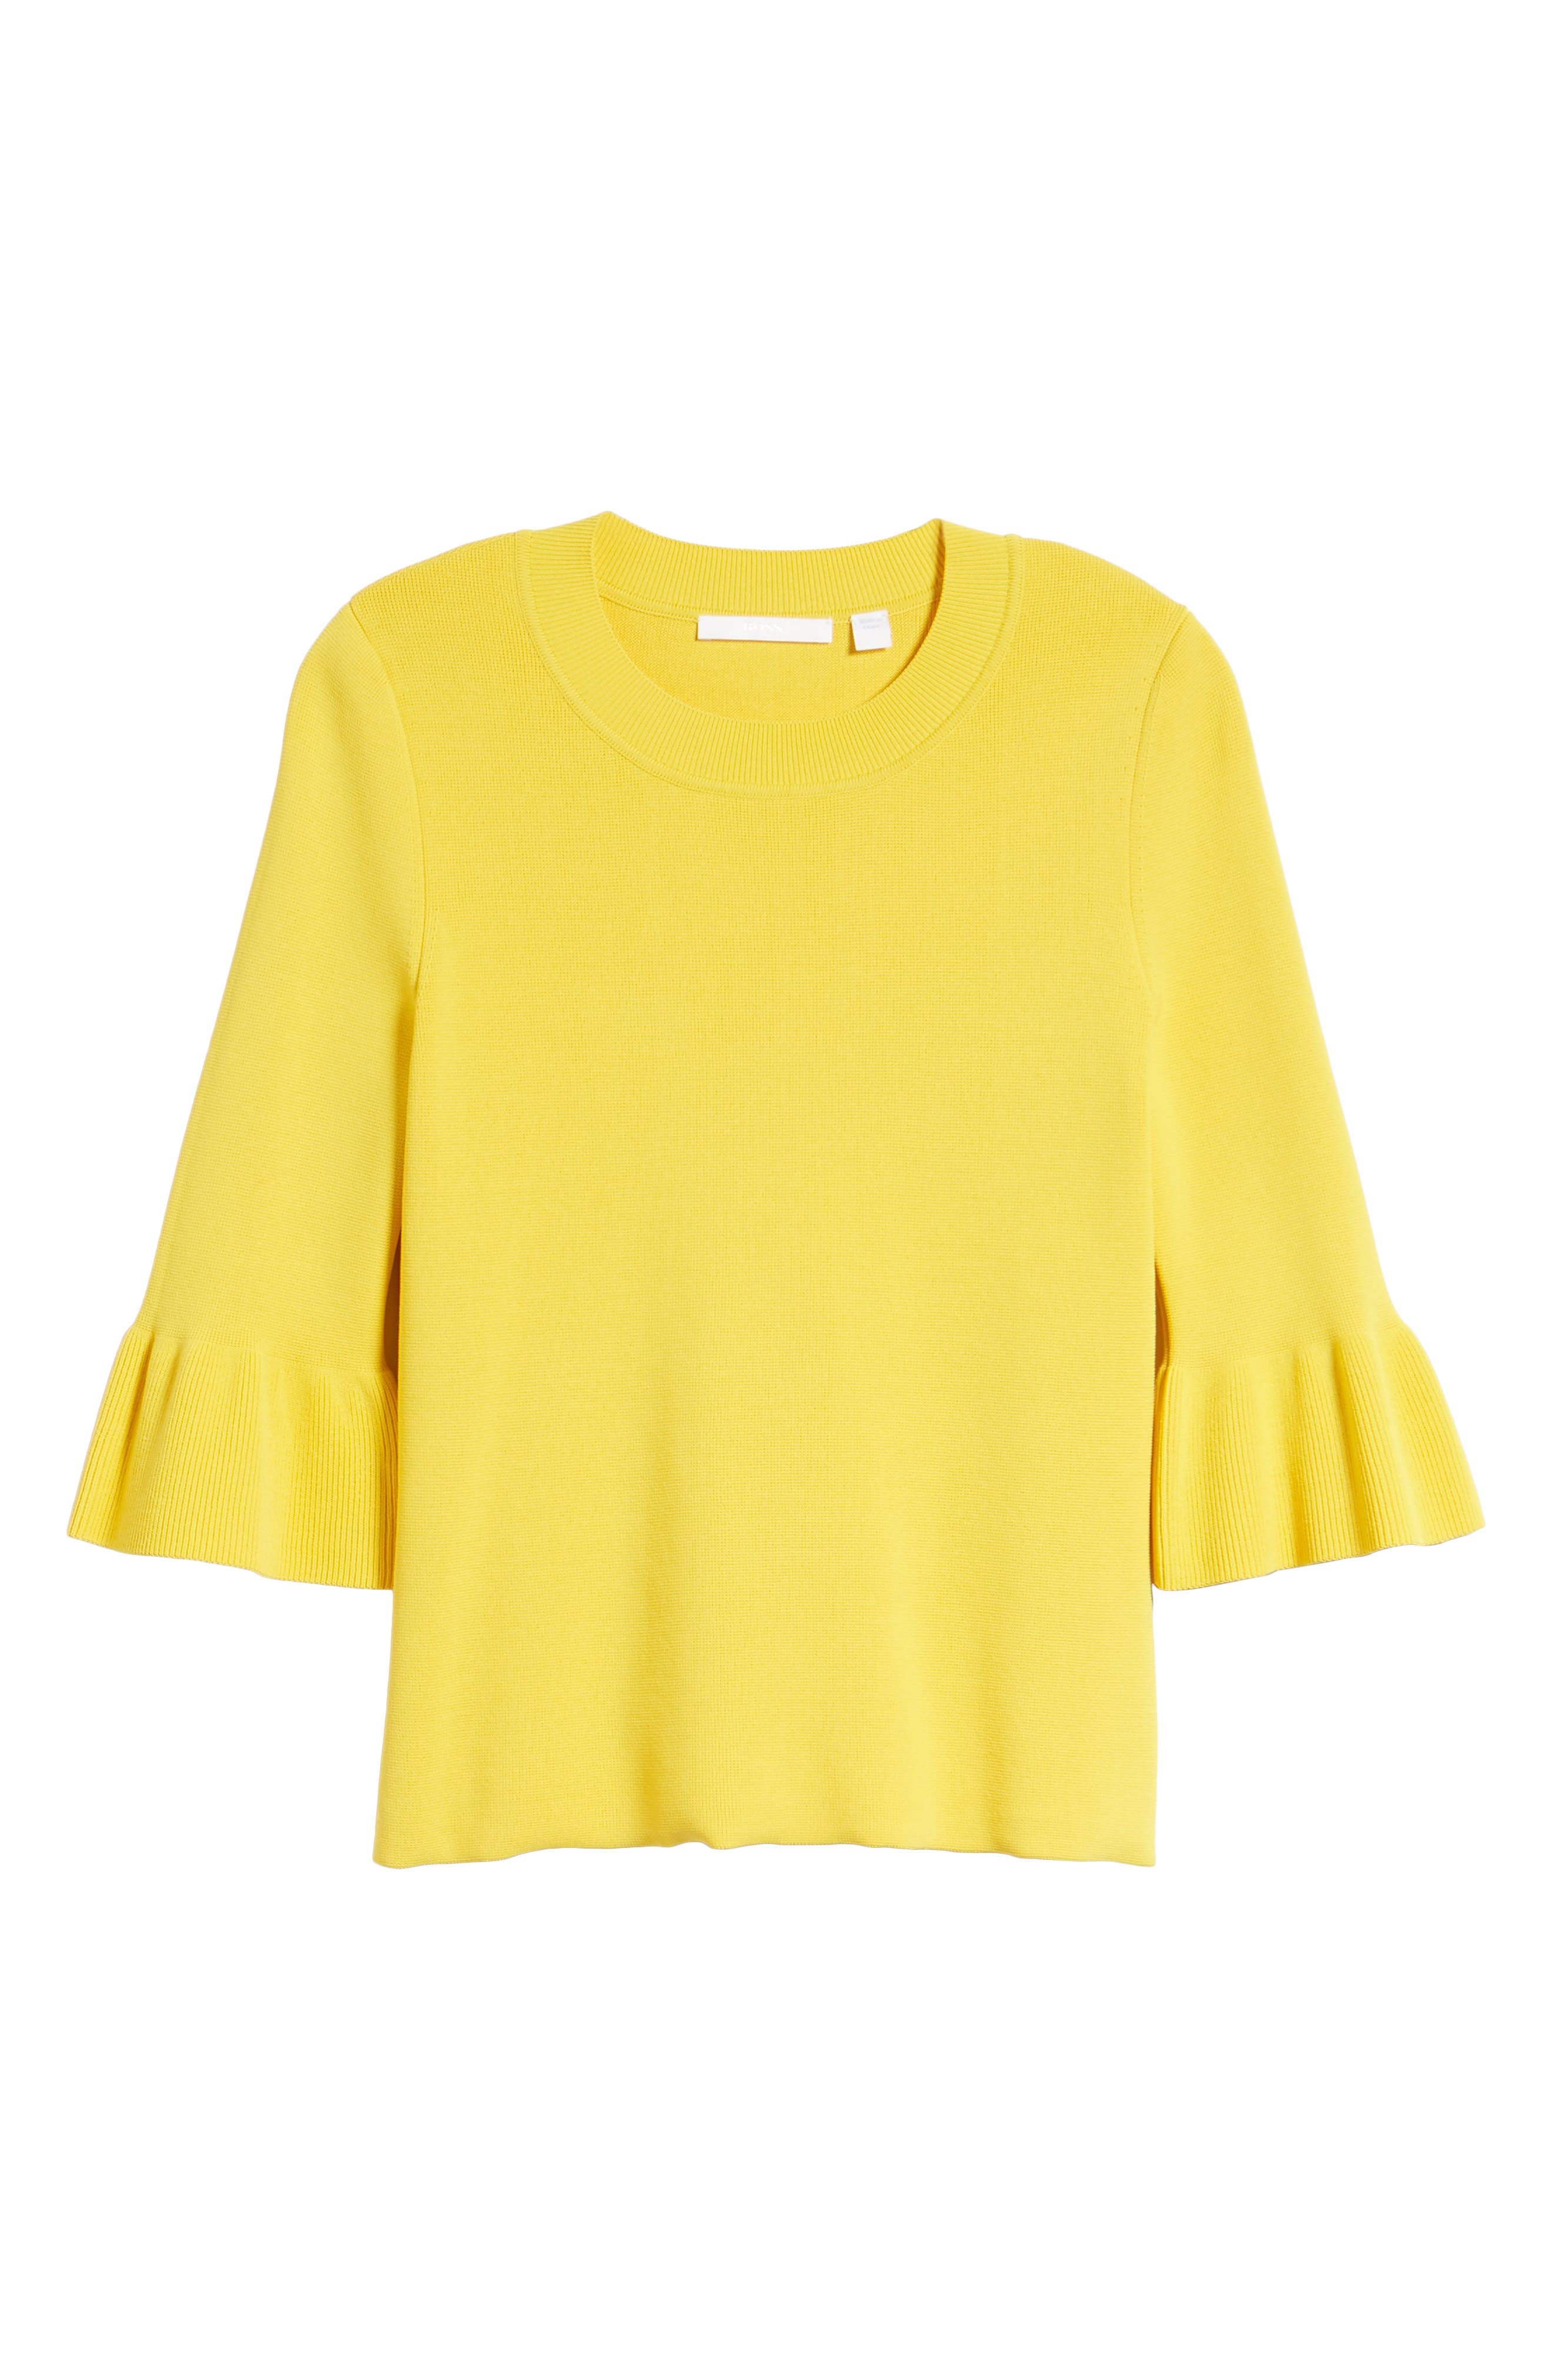 Fenella Ruffle Sleeve Sweater,                             Alternate thumbnail 7, color,                             723